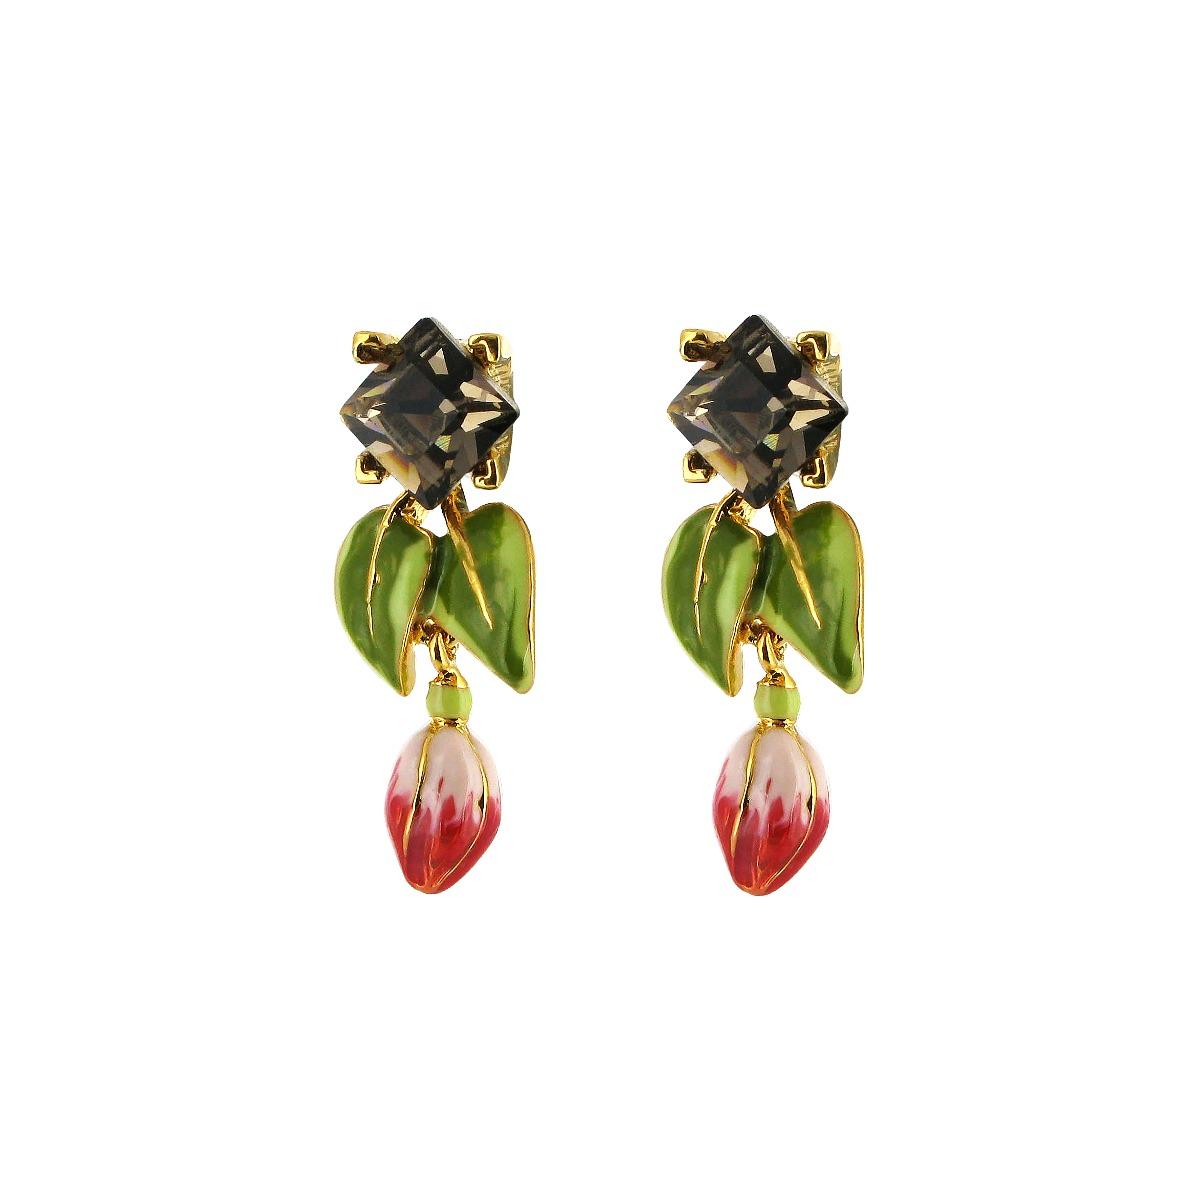 Floral swarovski drop earrings